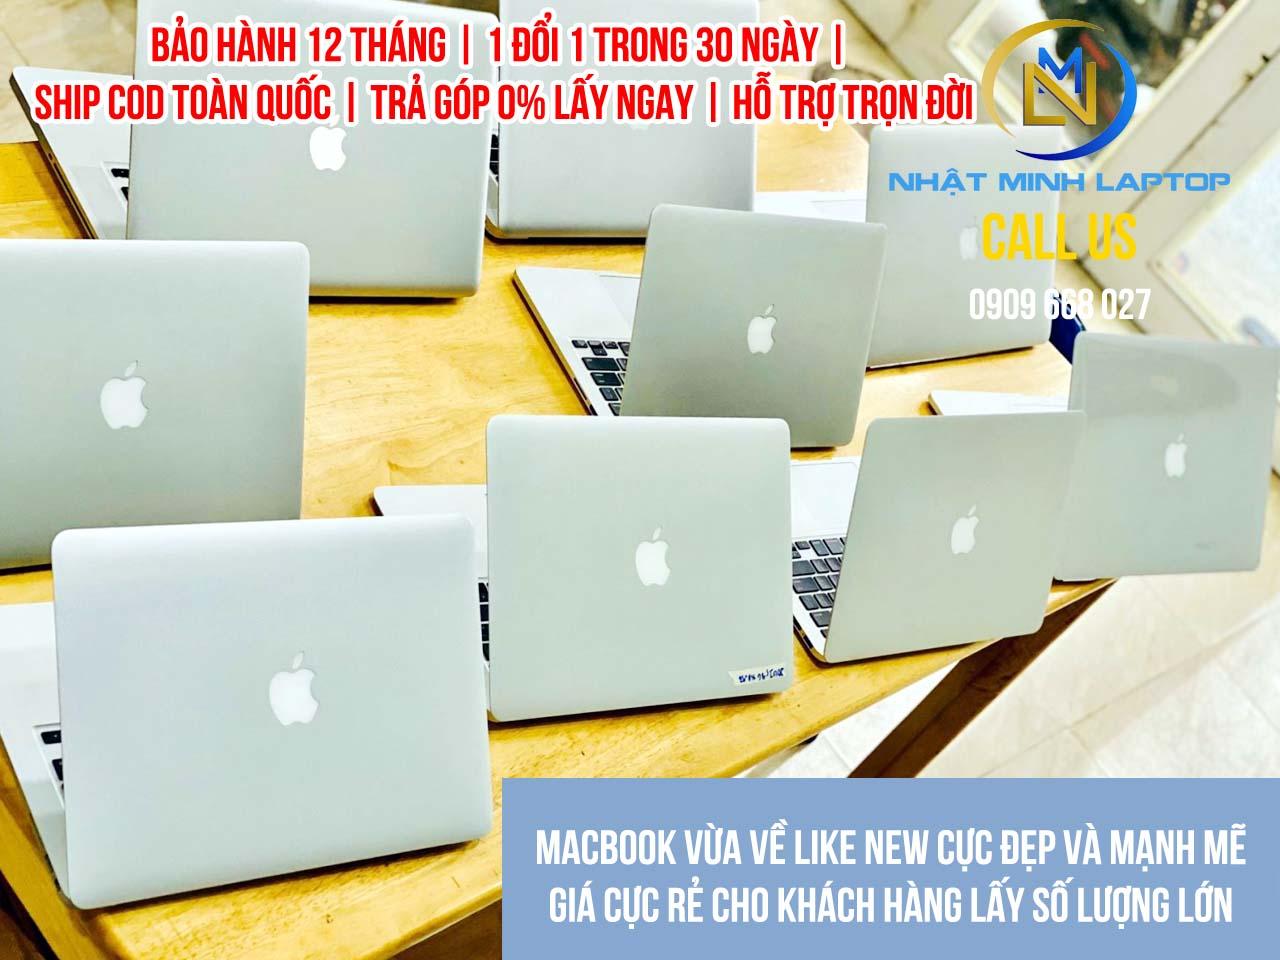 Laptop giá rẻ HCM